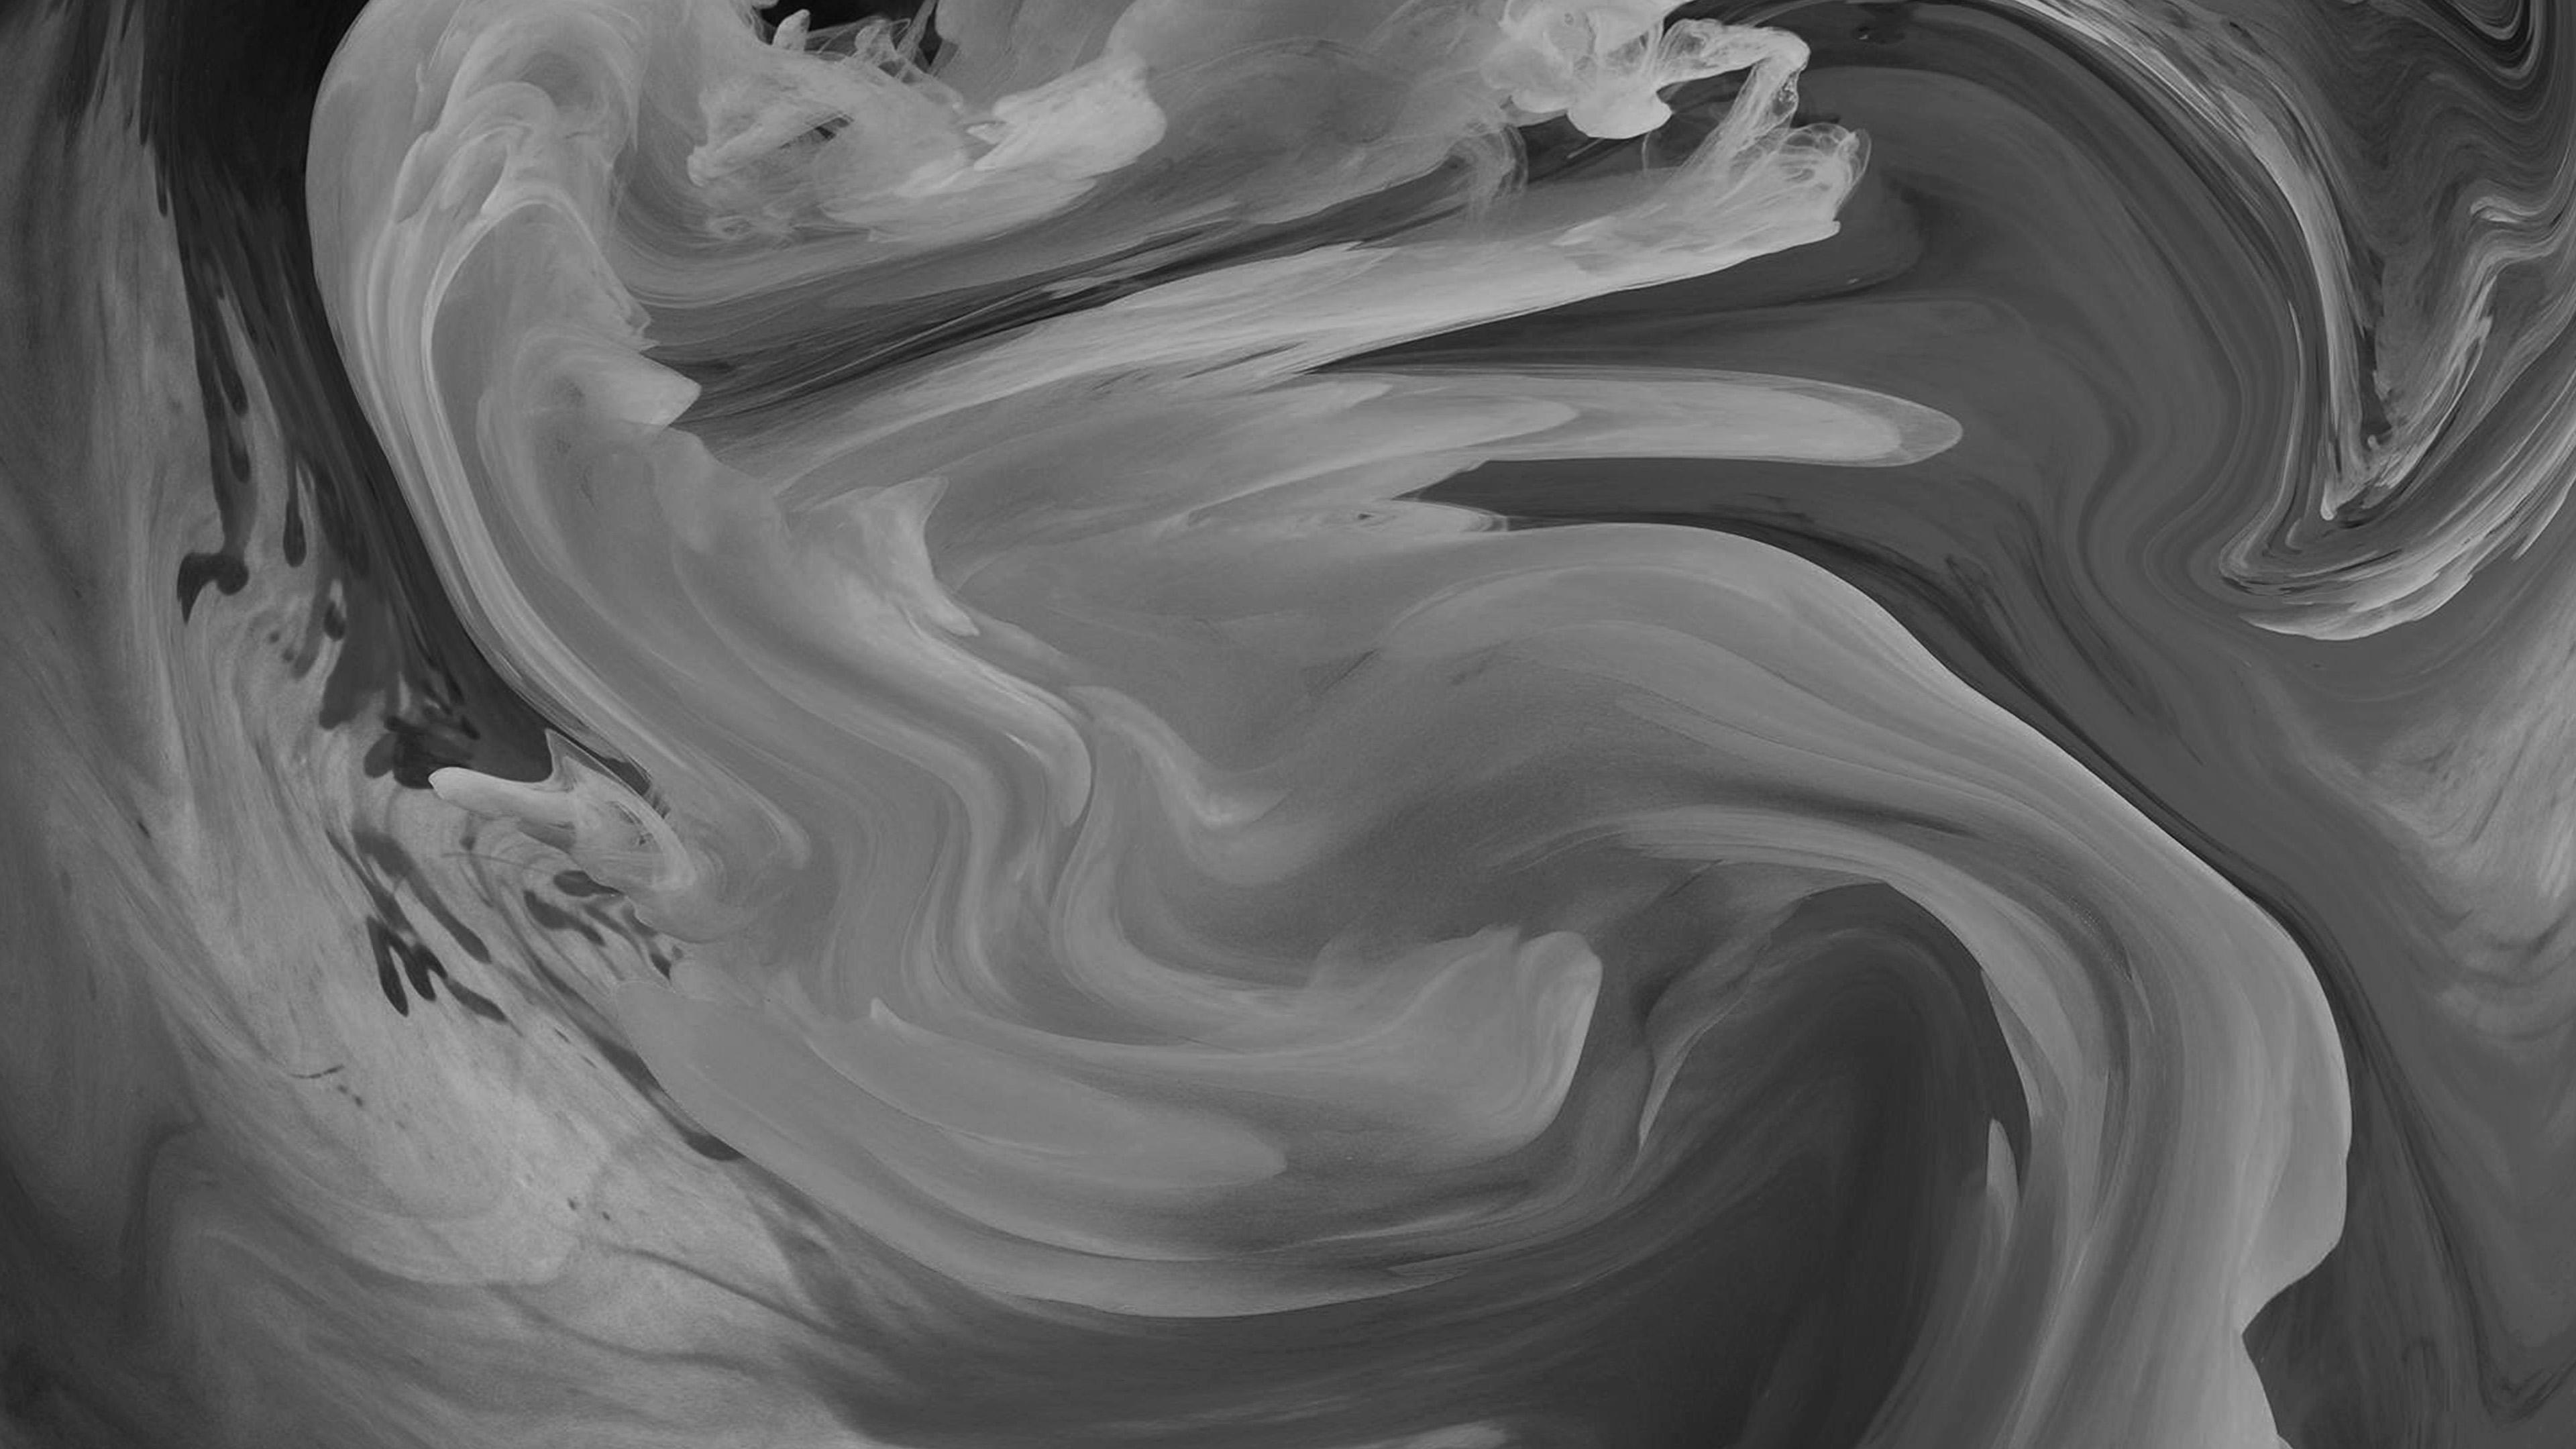 Fall Wallpaper 4k Vl09 Hurricane Swirl Abstract Art Paint Dark Bw Pattern